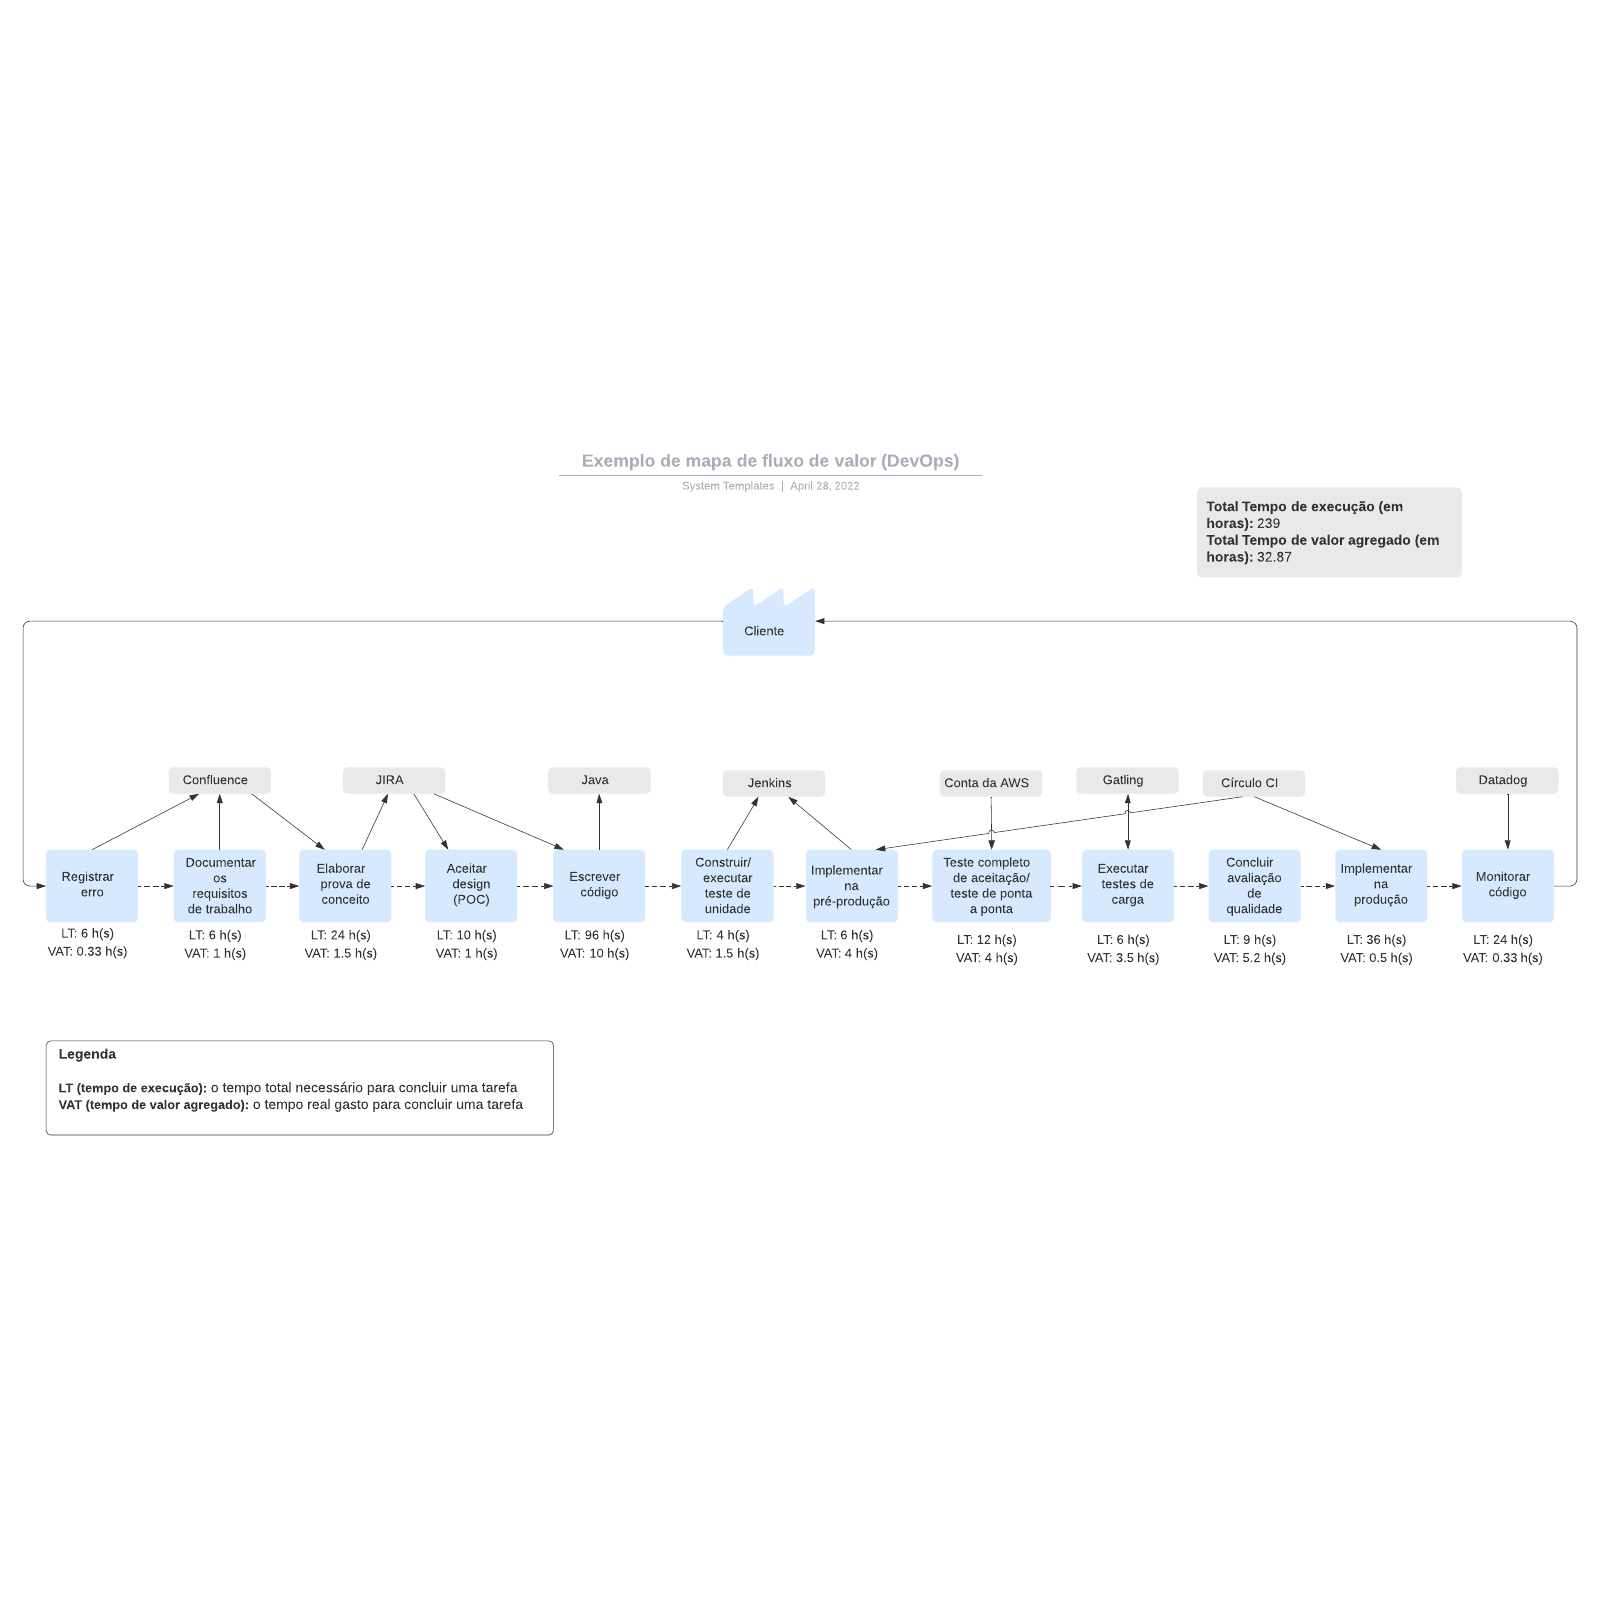 Exemplo de mapa de fluxo de valor (DevOps)